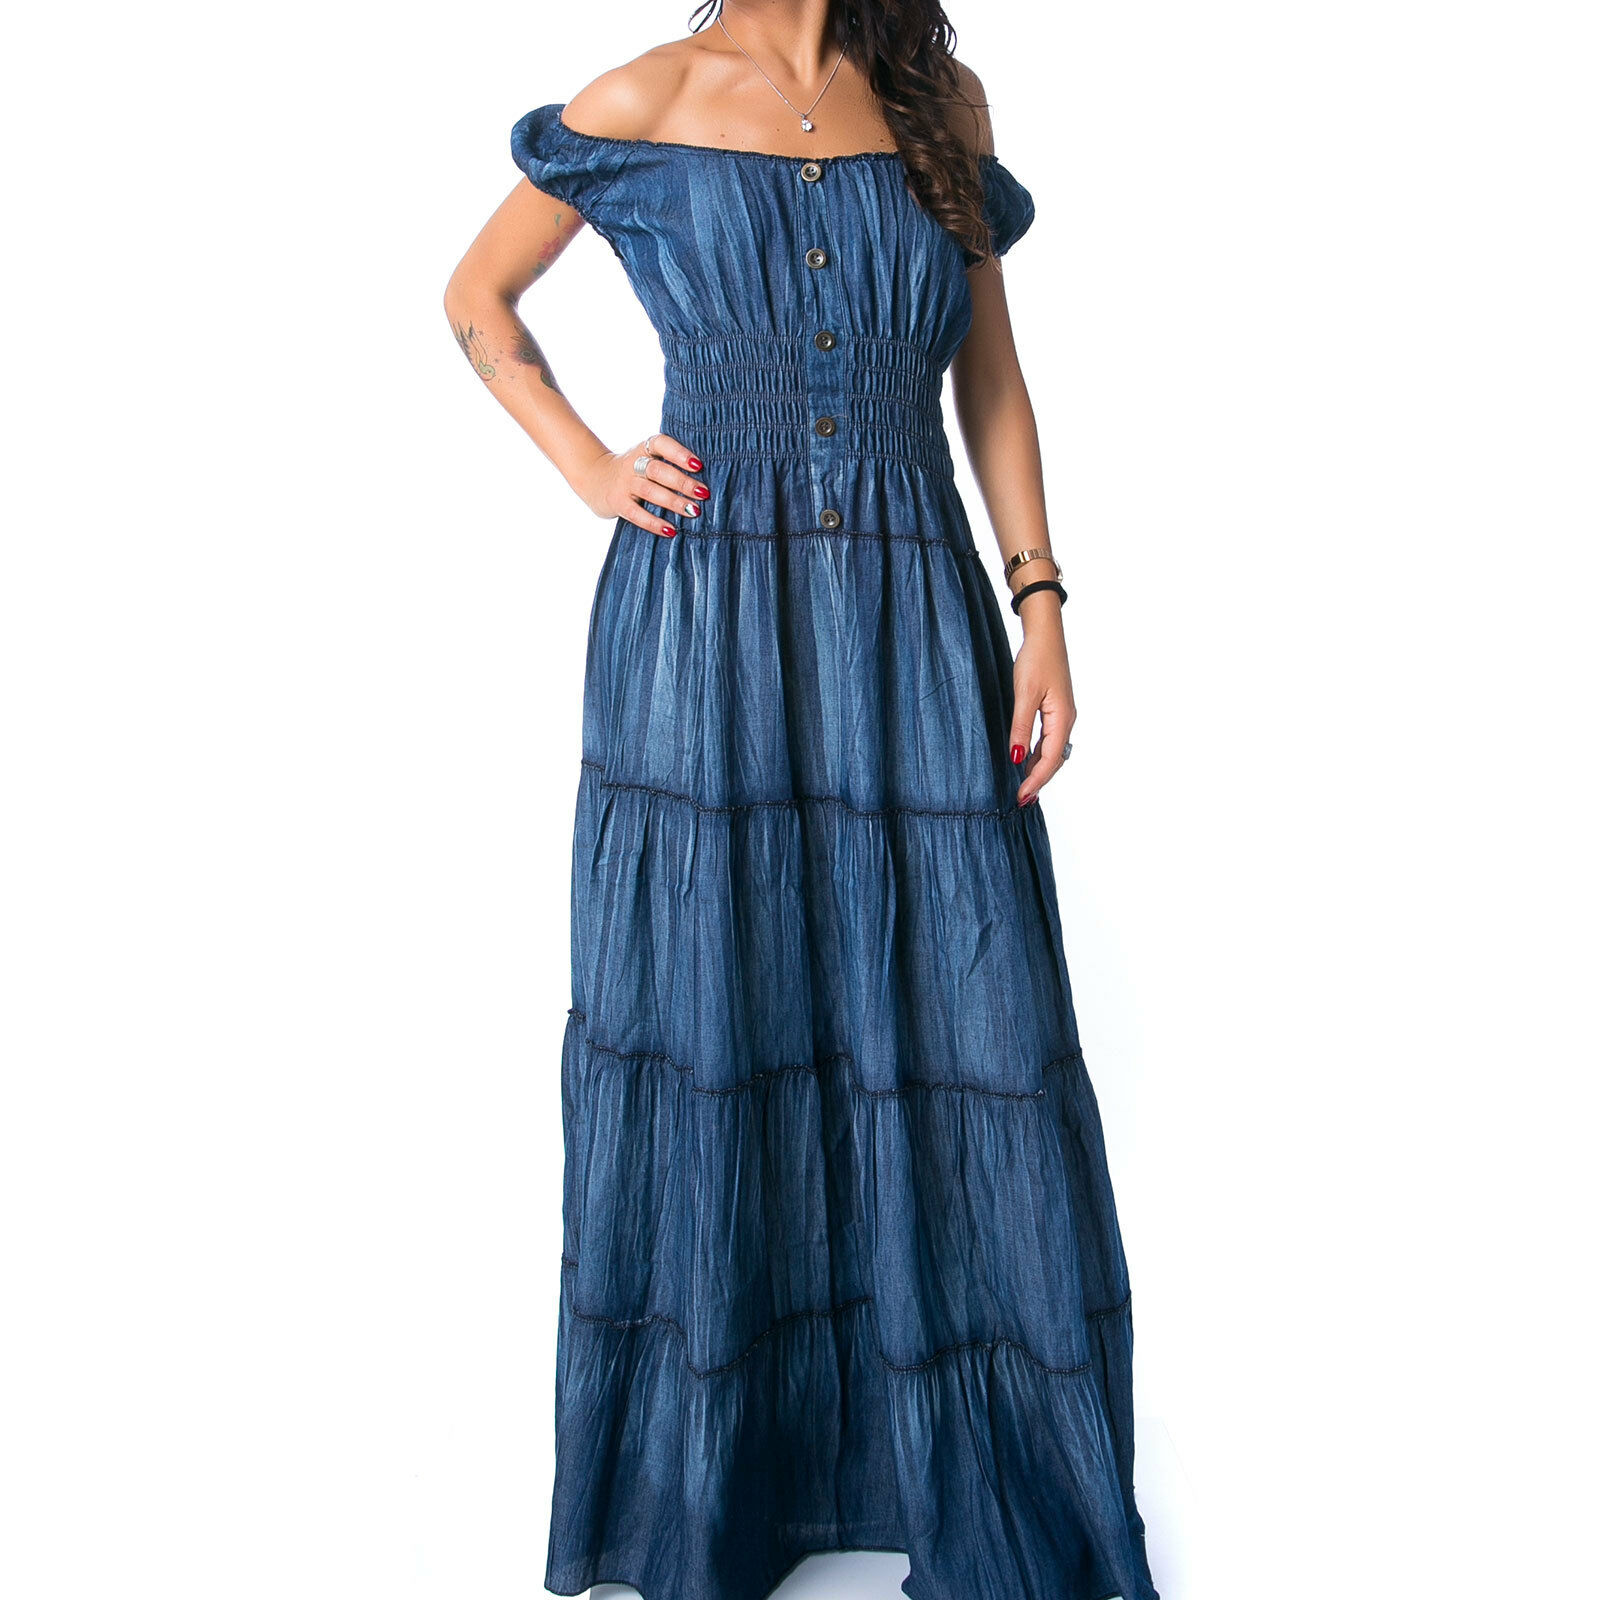 vestito vestitino abito lungo jeans elastico bandeau zingara gitana 607 ff50a53e409